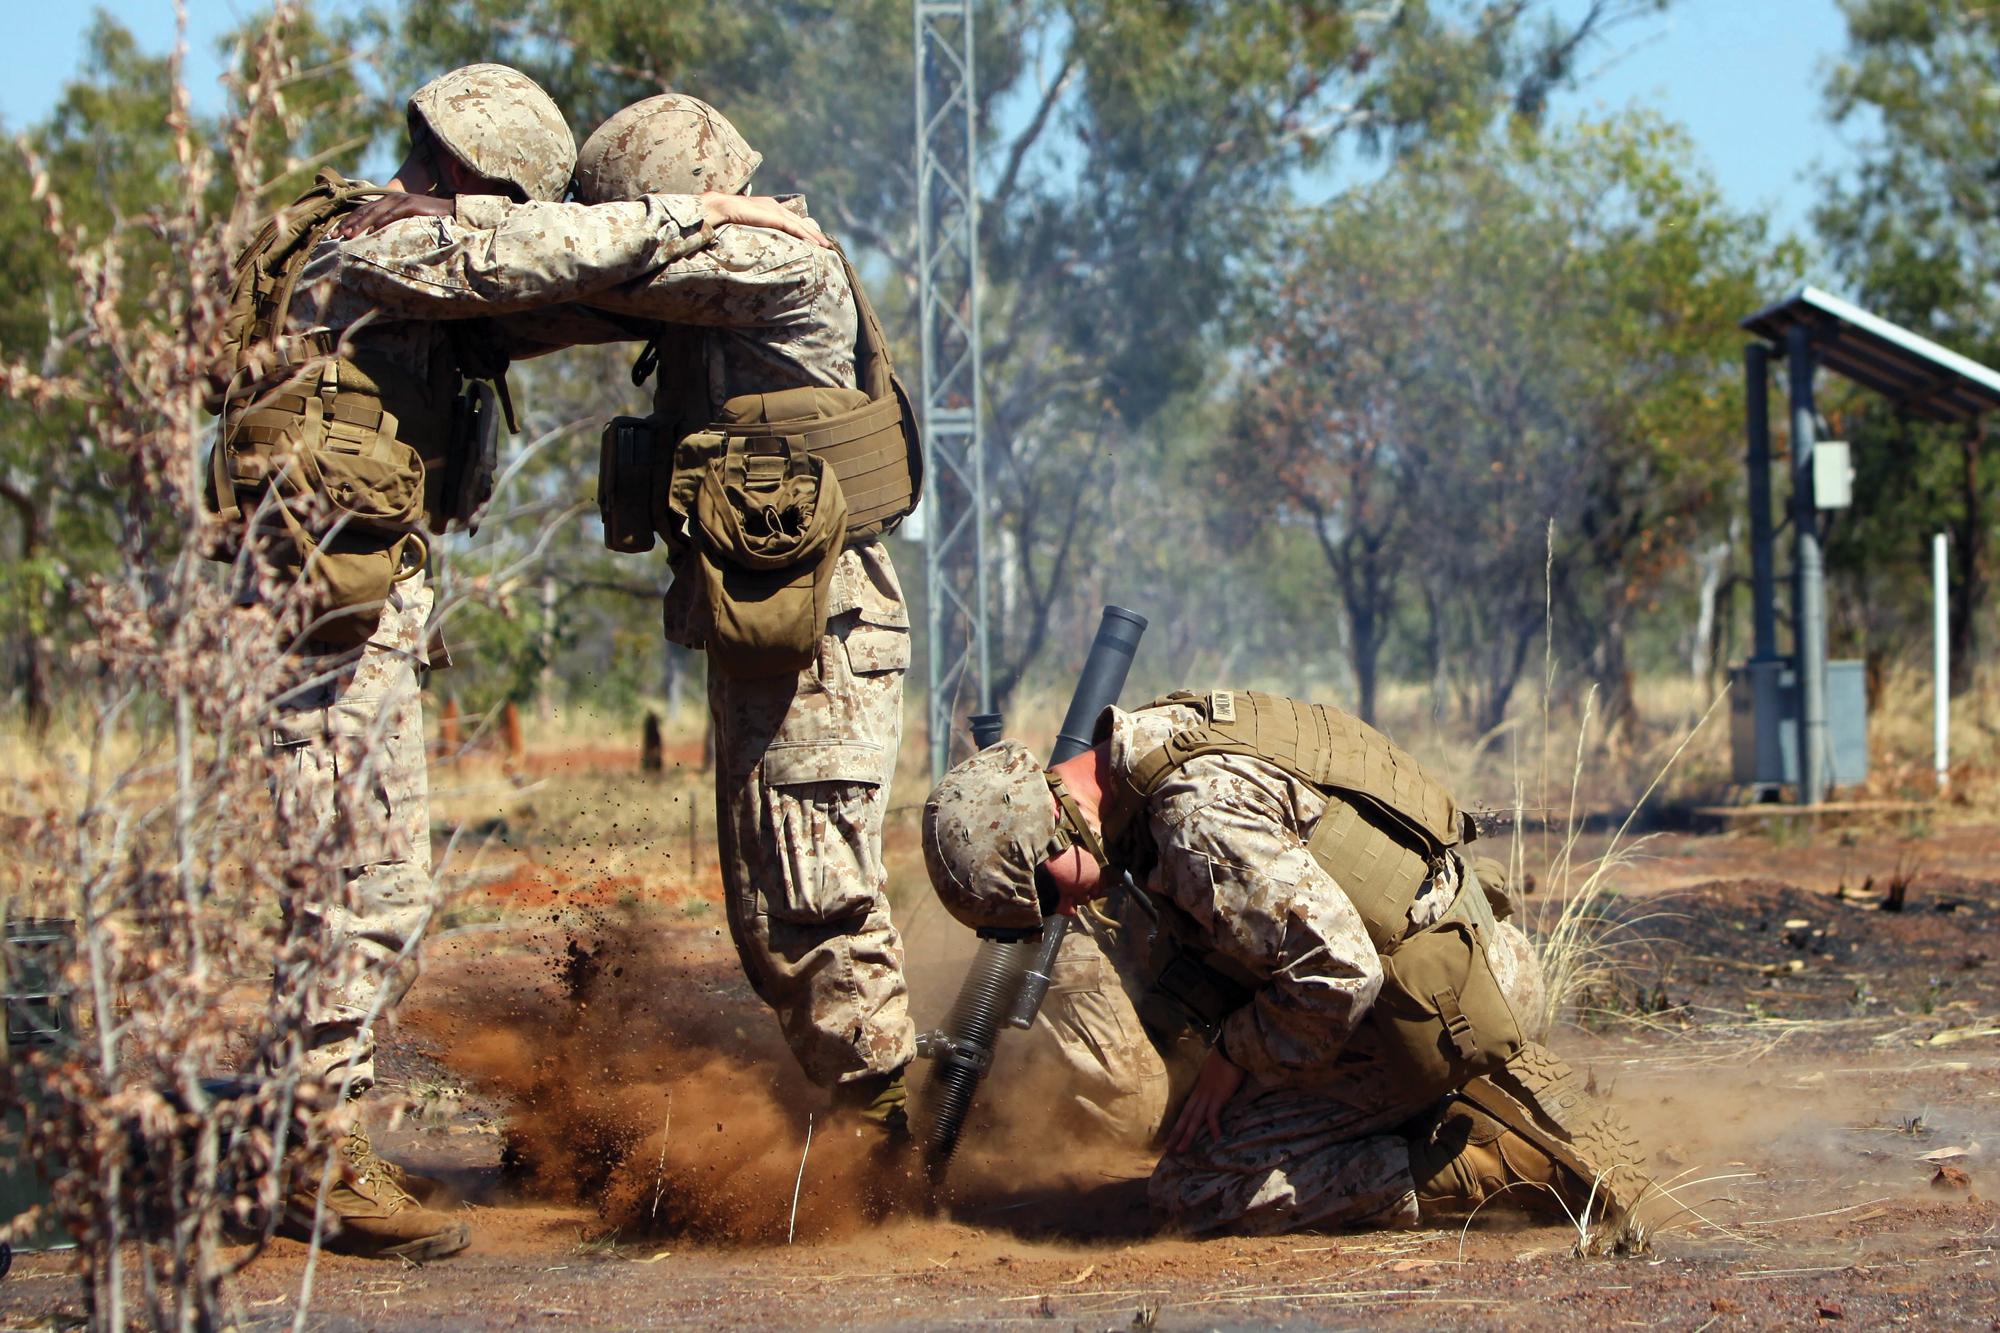 Funny Usmc Mortars : 'fun and frisky down under